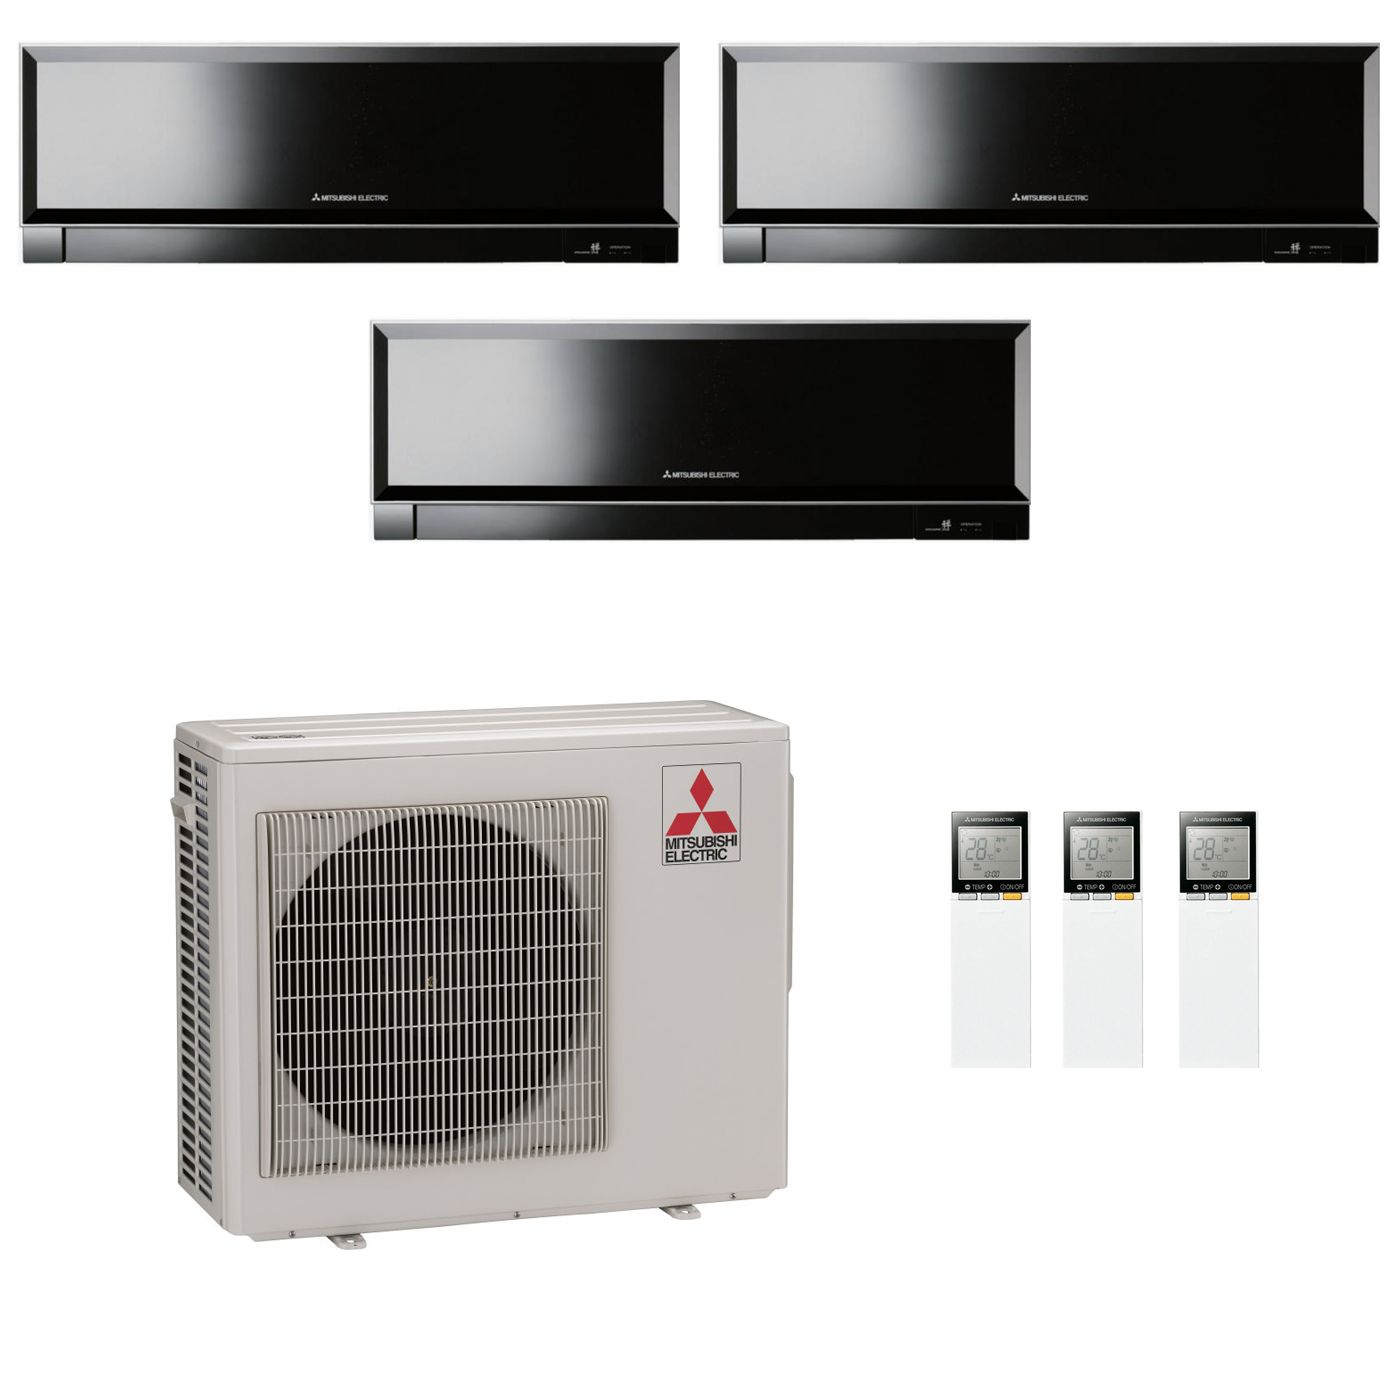 Mitsubishi Room Air Conditioner Reviews: Mitsubishi Electric Air Conditioning MXZ-4D83VA 2 X 3.5Kw